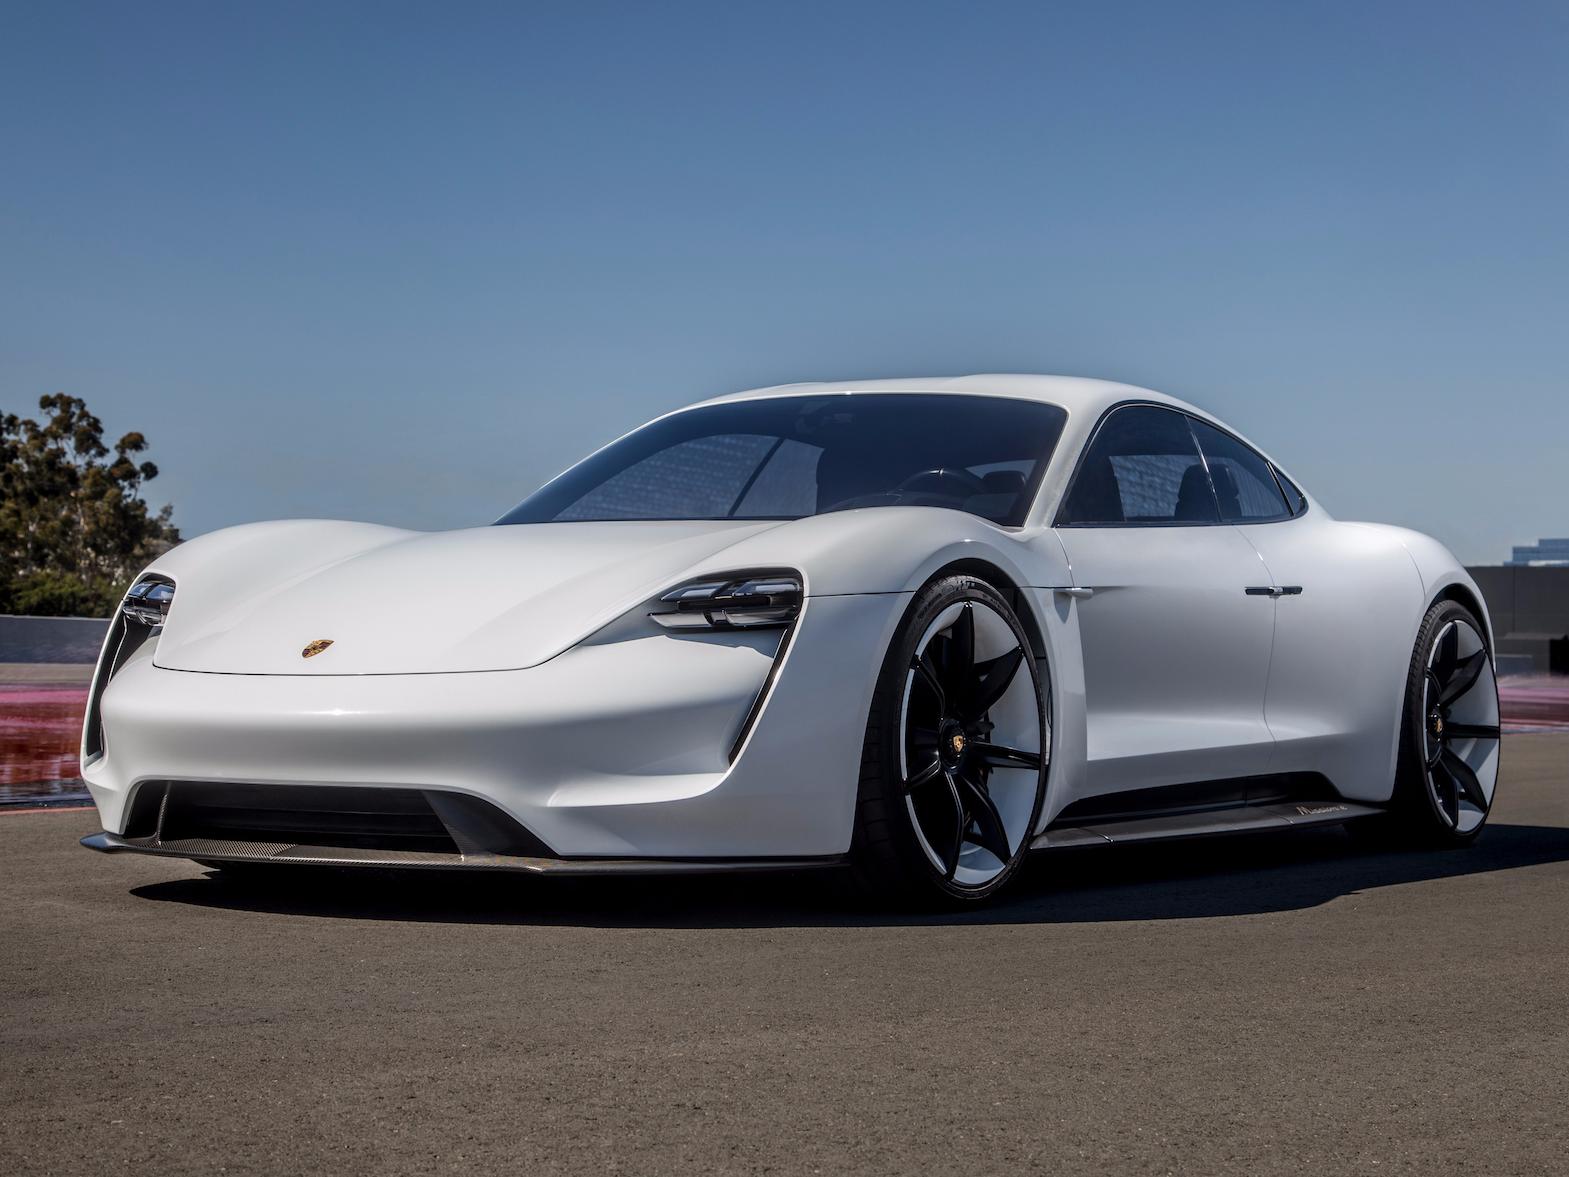 Porsche's first electric car will have an unprecedented feature that should make Tesla nervous (TSLA)